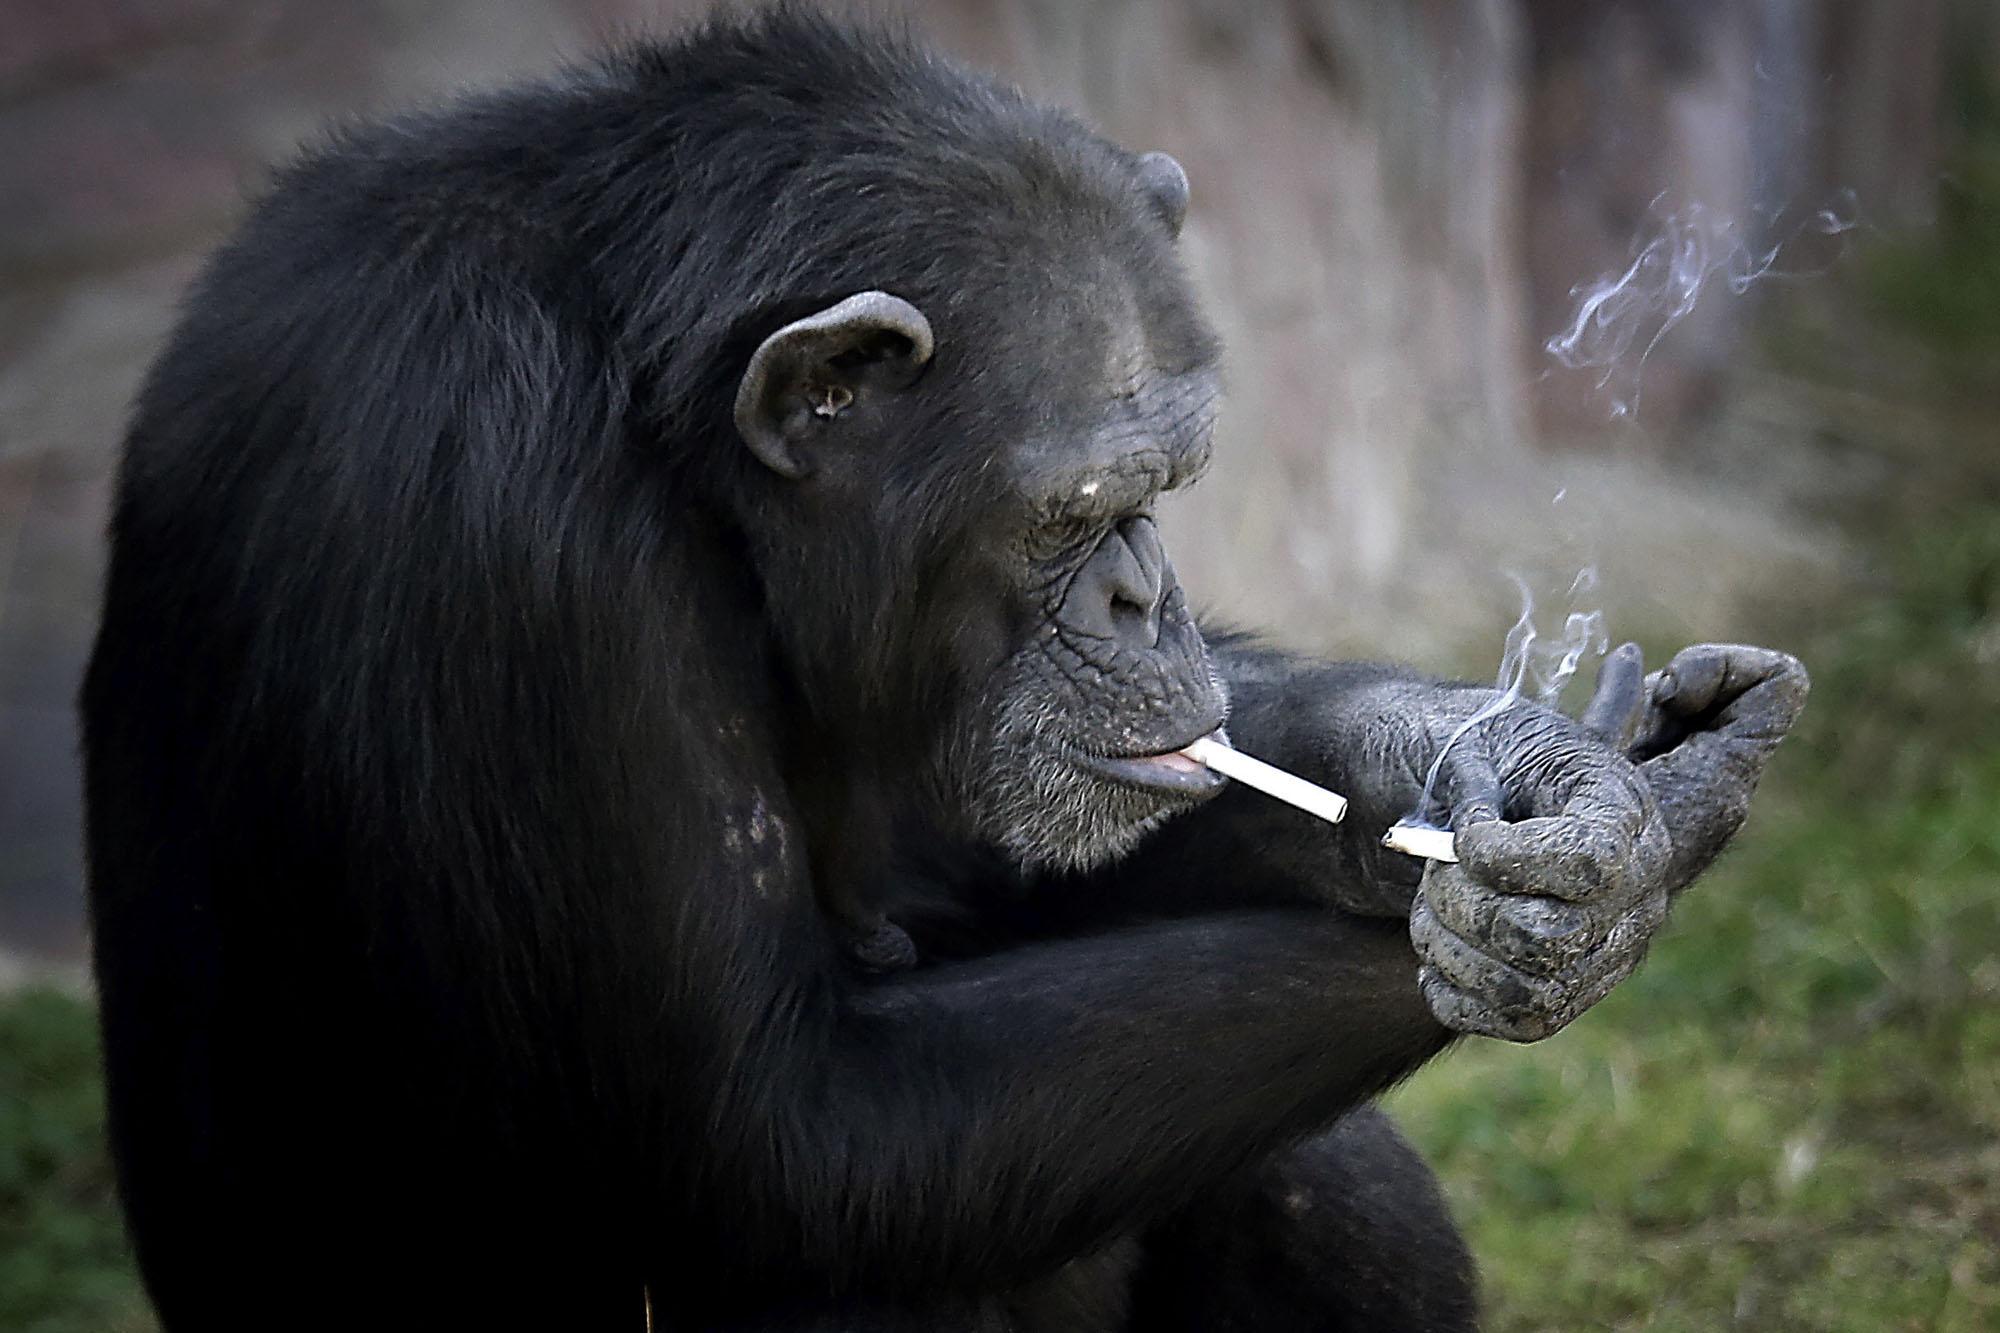 Chimpanzee Smoking